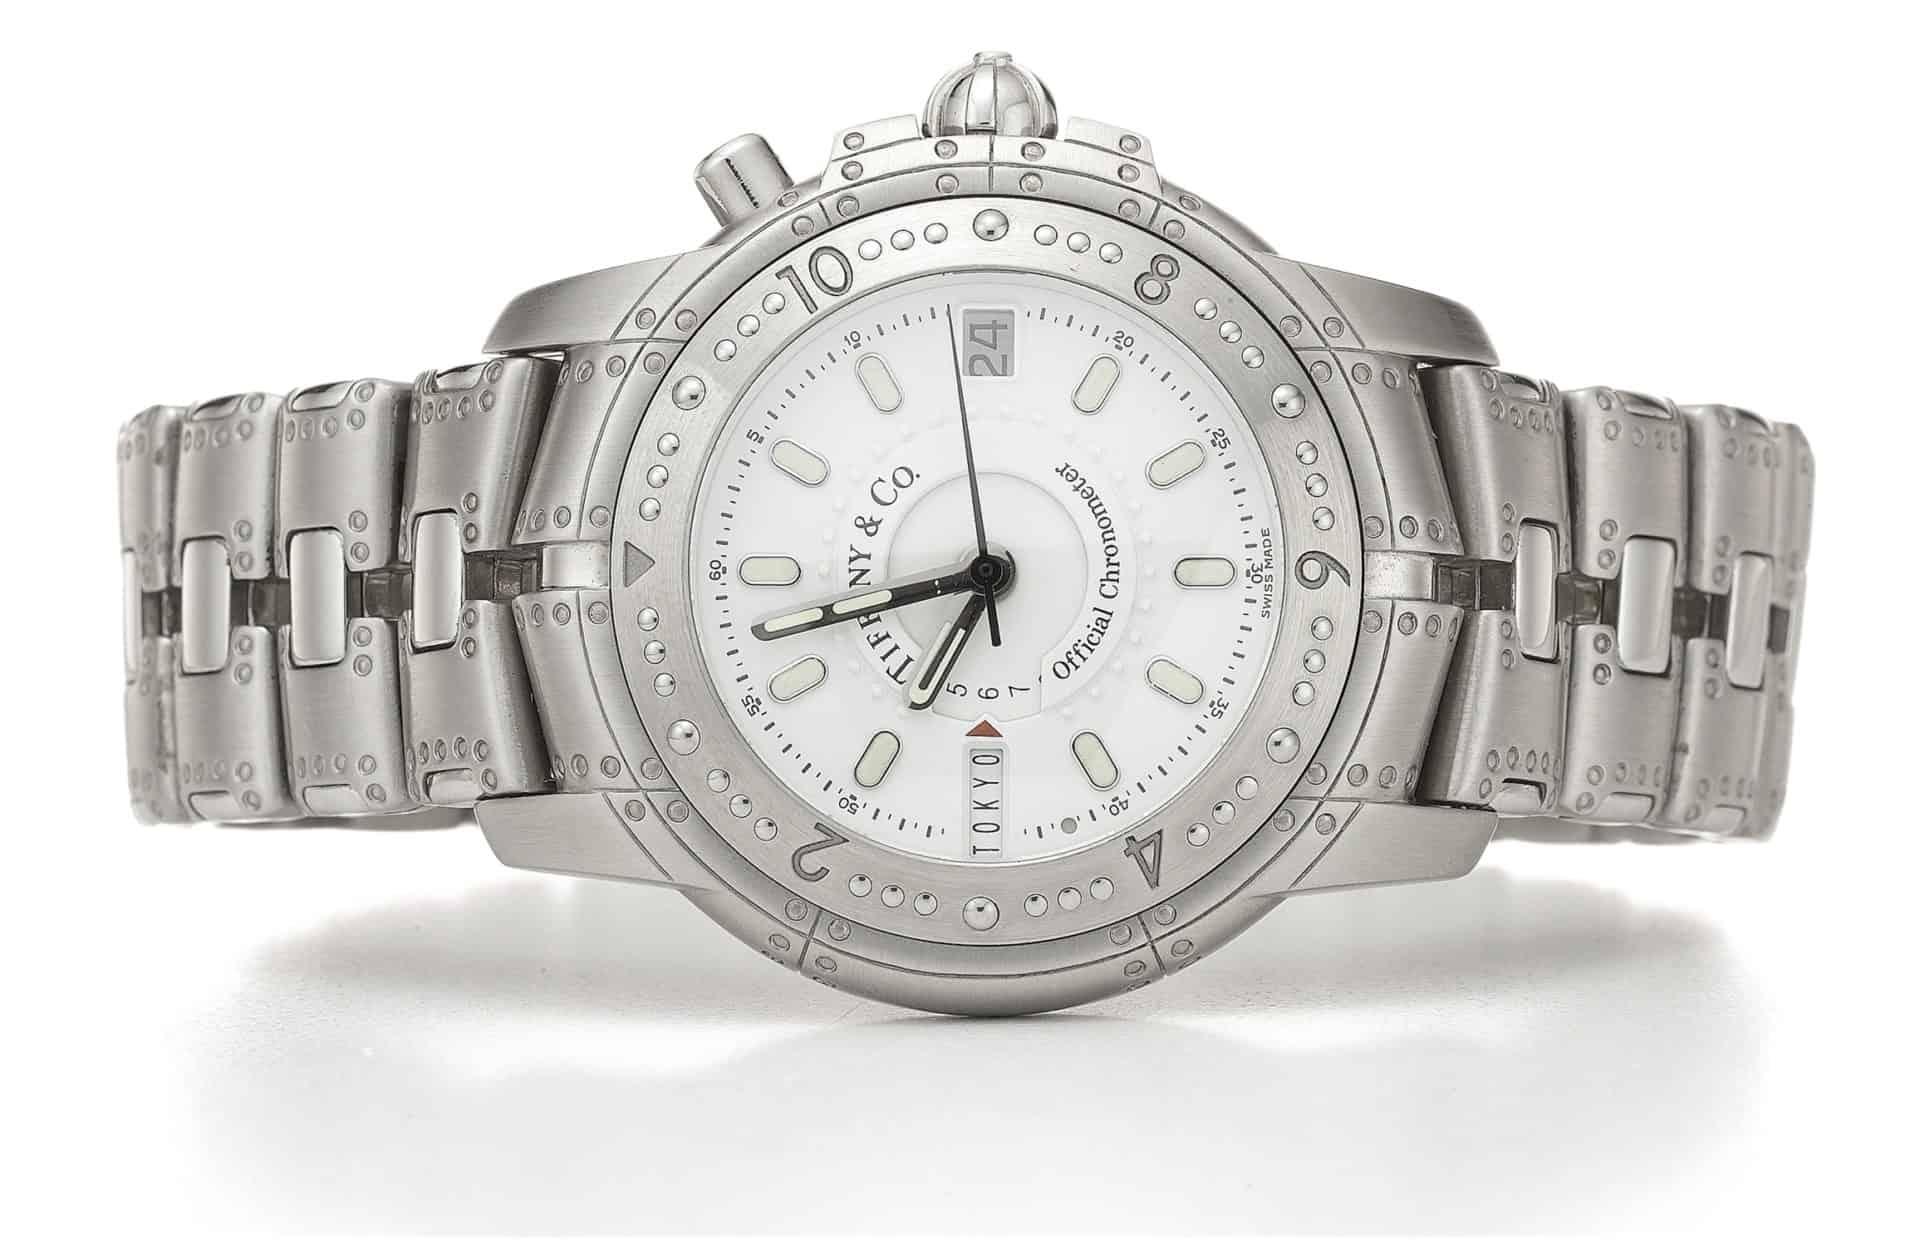 Tiffany Streamerica Watch